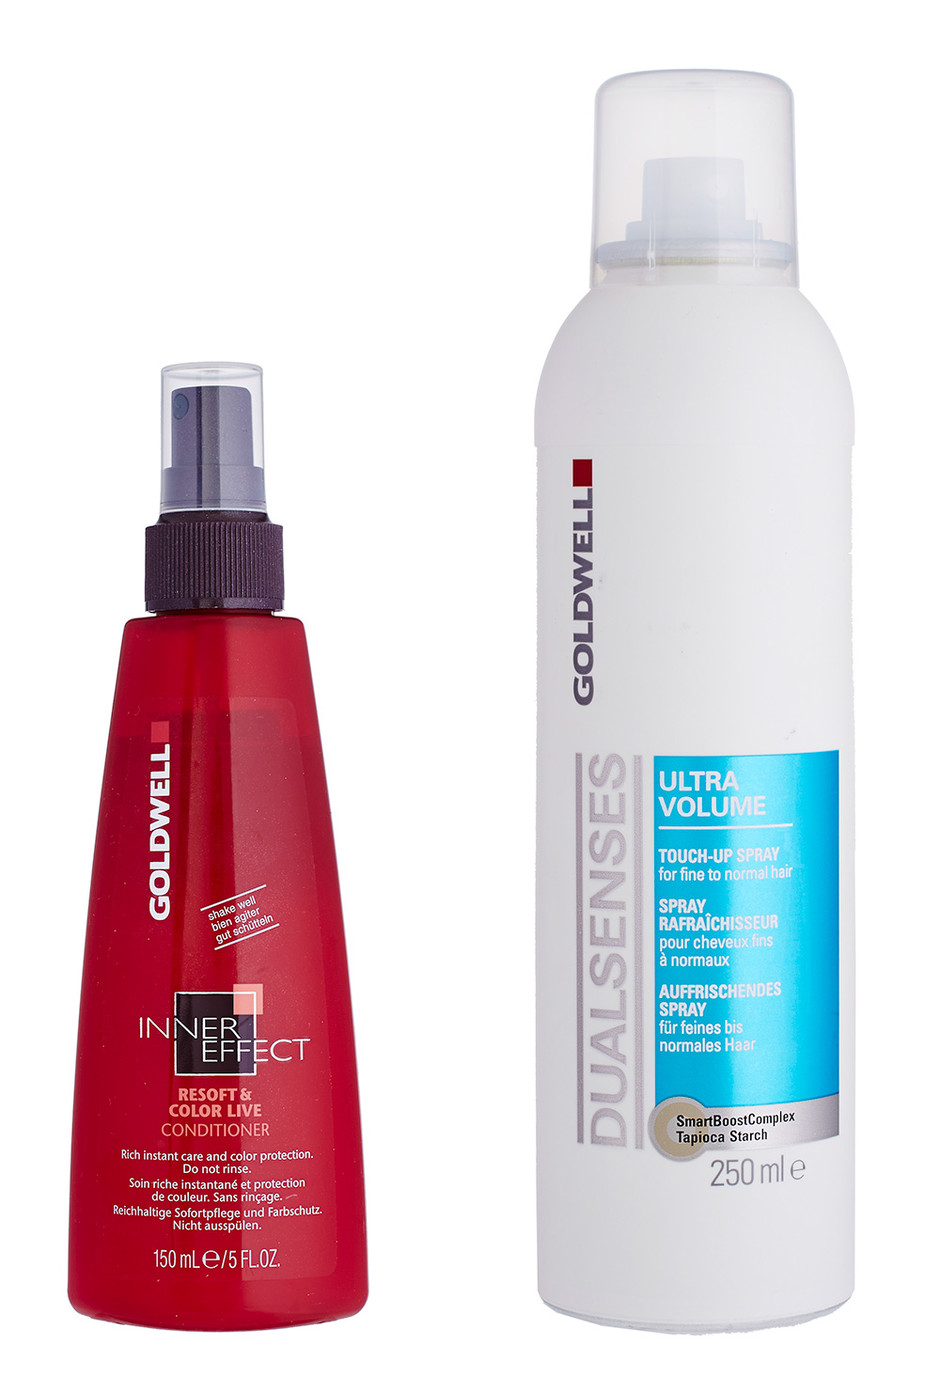 Кондиционер для окрашенных волос Inner Effect Resoft & Color Live Conditioner и спрей Ultra Volume Touch Up Spray, Goldwell